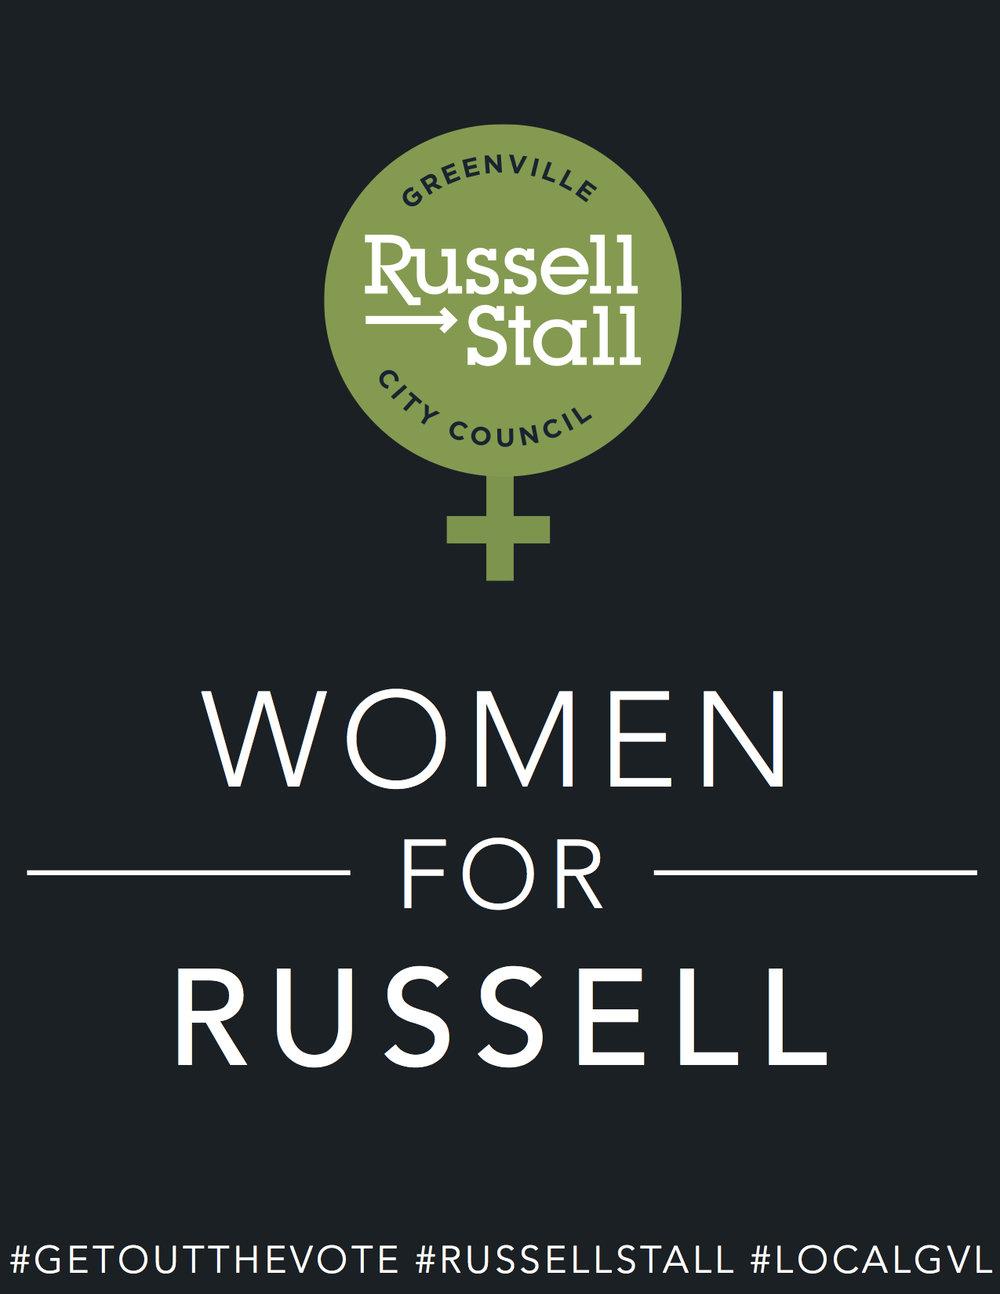 women 4 russell.jpg